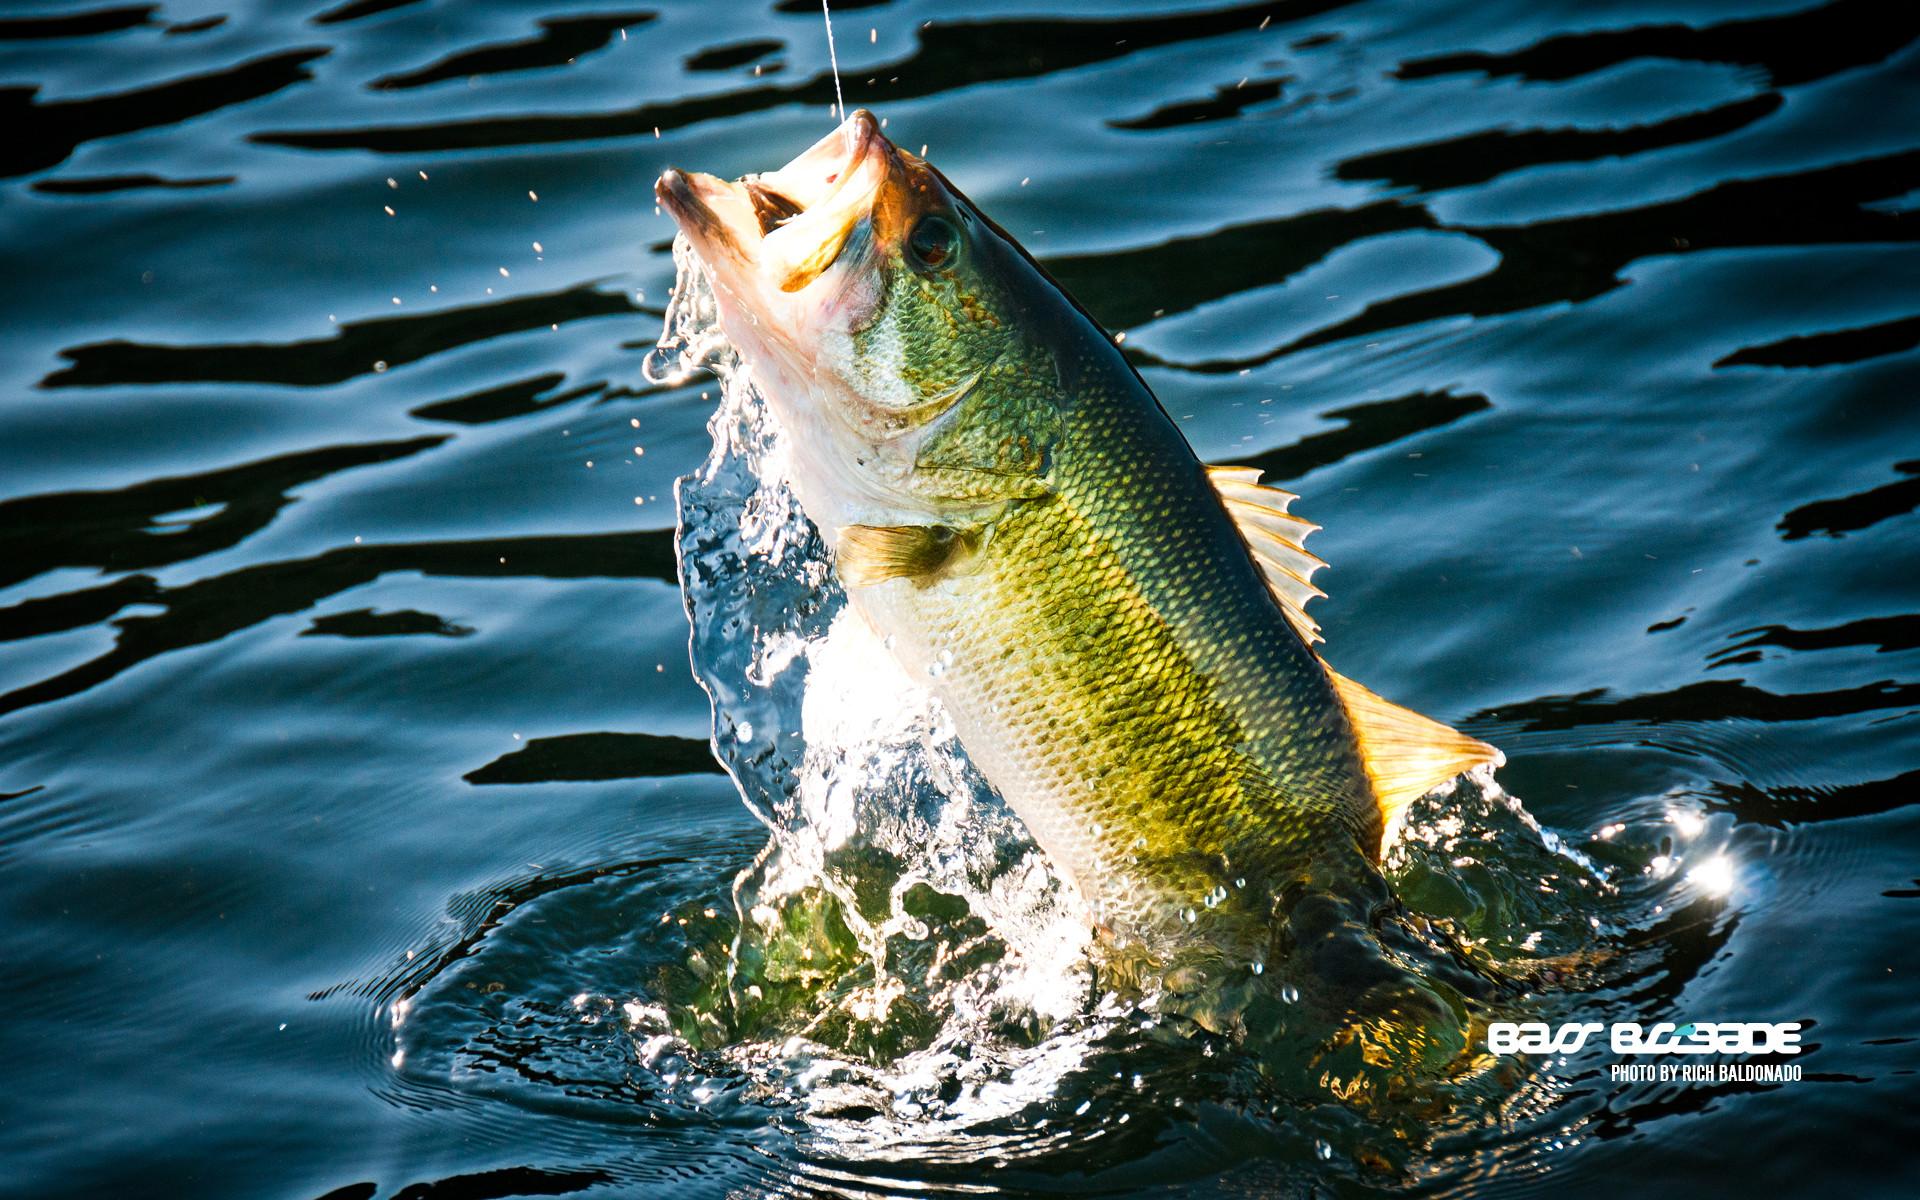 Pin Bass Fishing Desktop Wallpaper on Pinterest